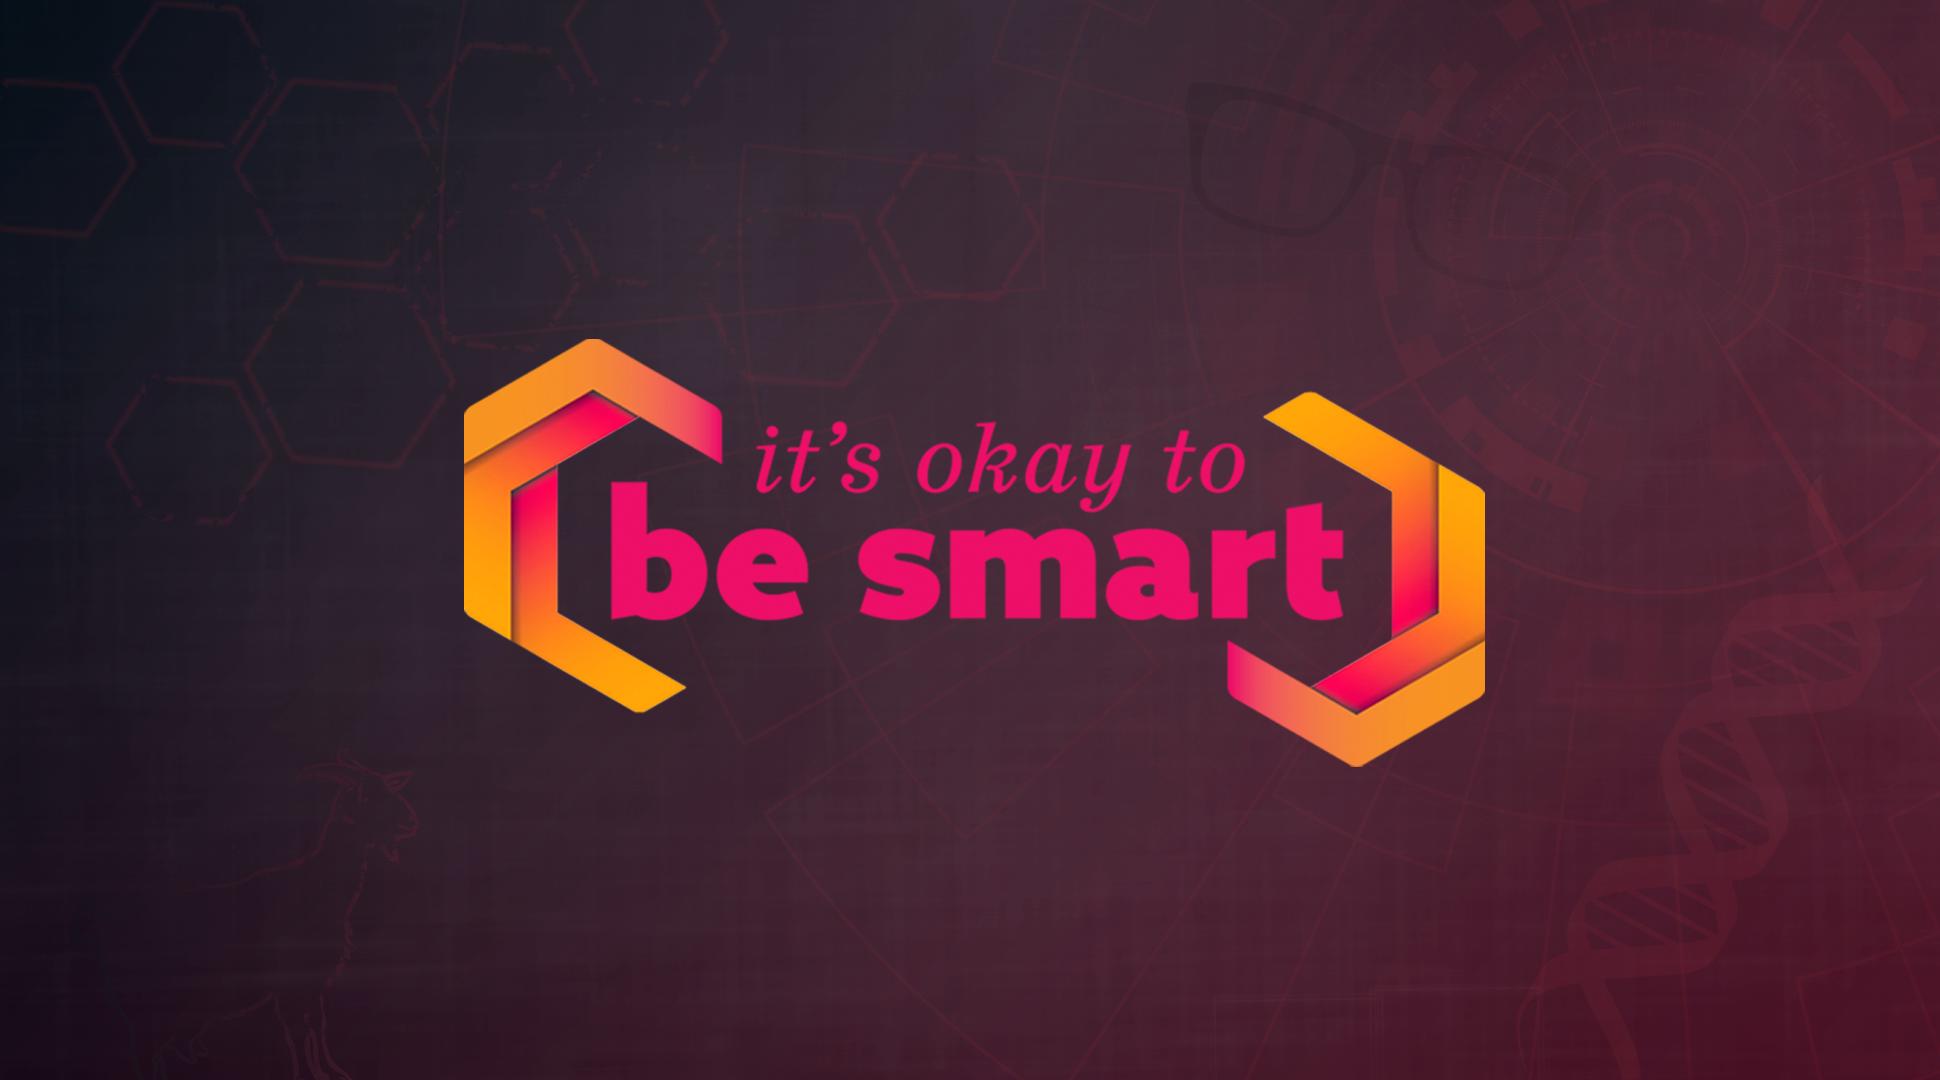 It's OKAY to be Smart